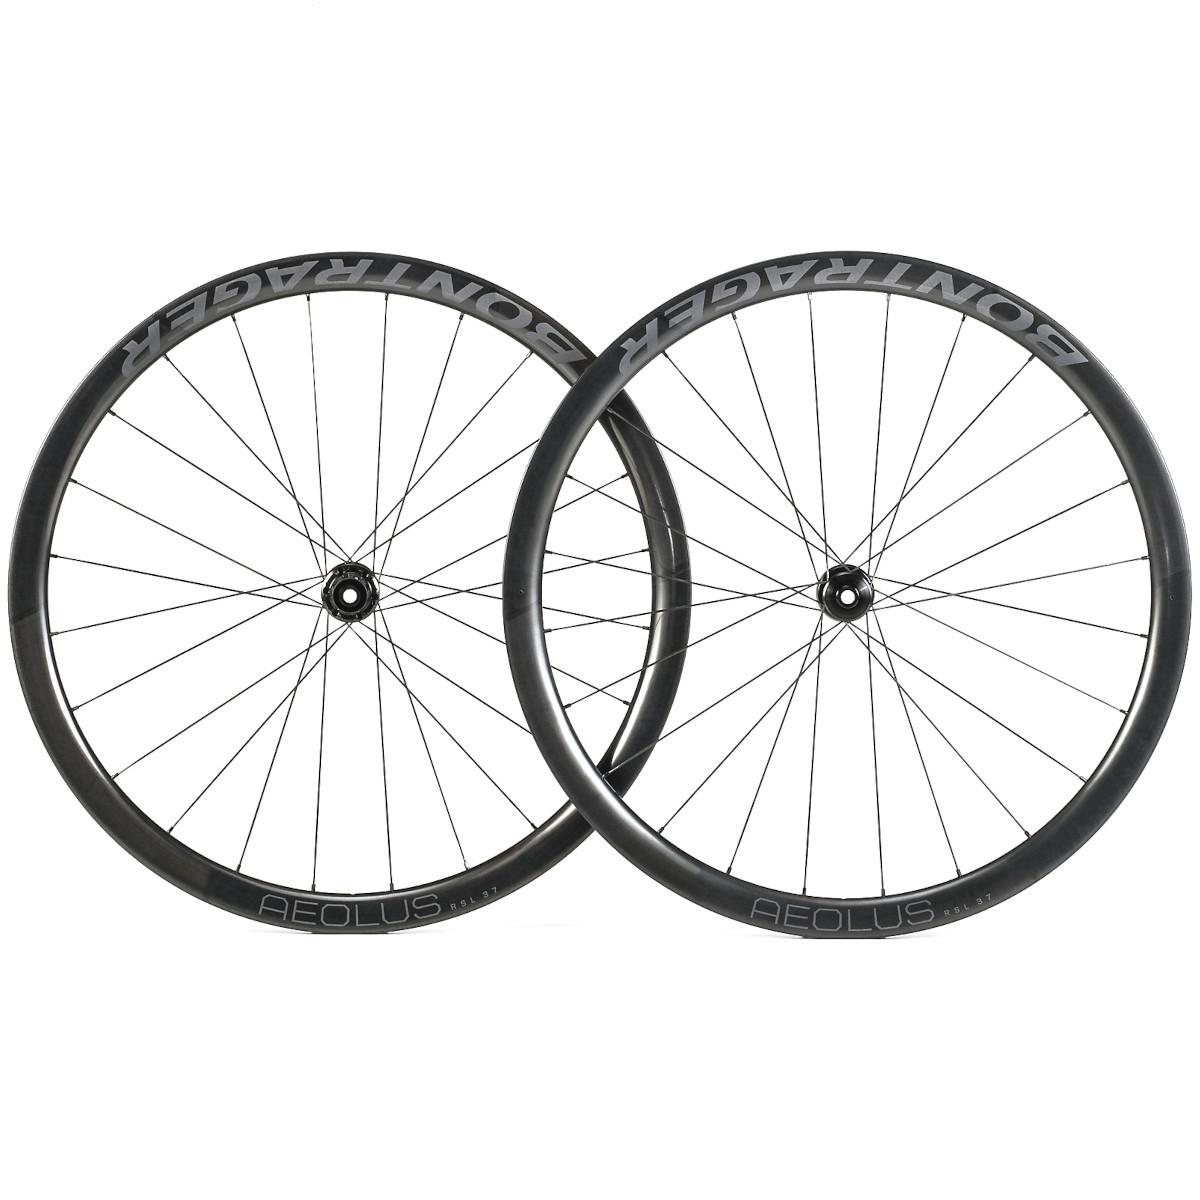 Image of Bontrager Aeolus RSL 37 TLR Road Wheel Set - Clincher - Centerlock - FW: 12x100 mm   RW: 12x135/142mm